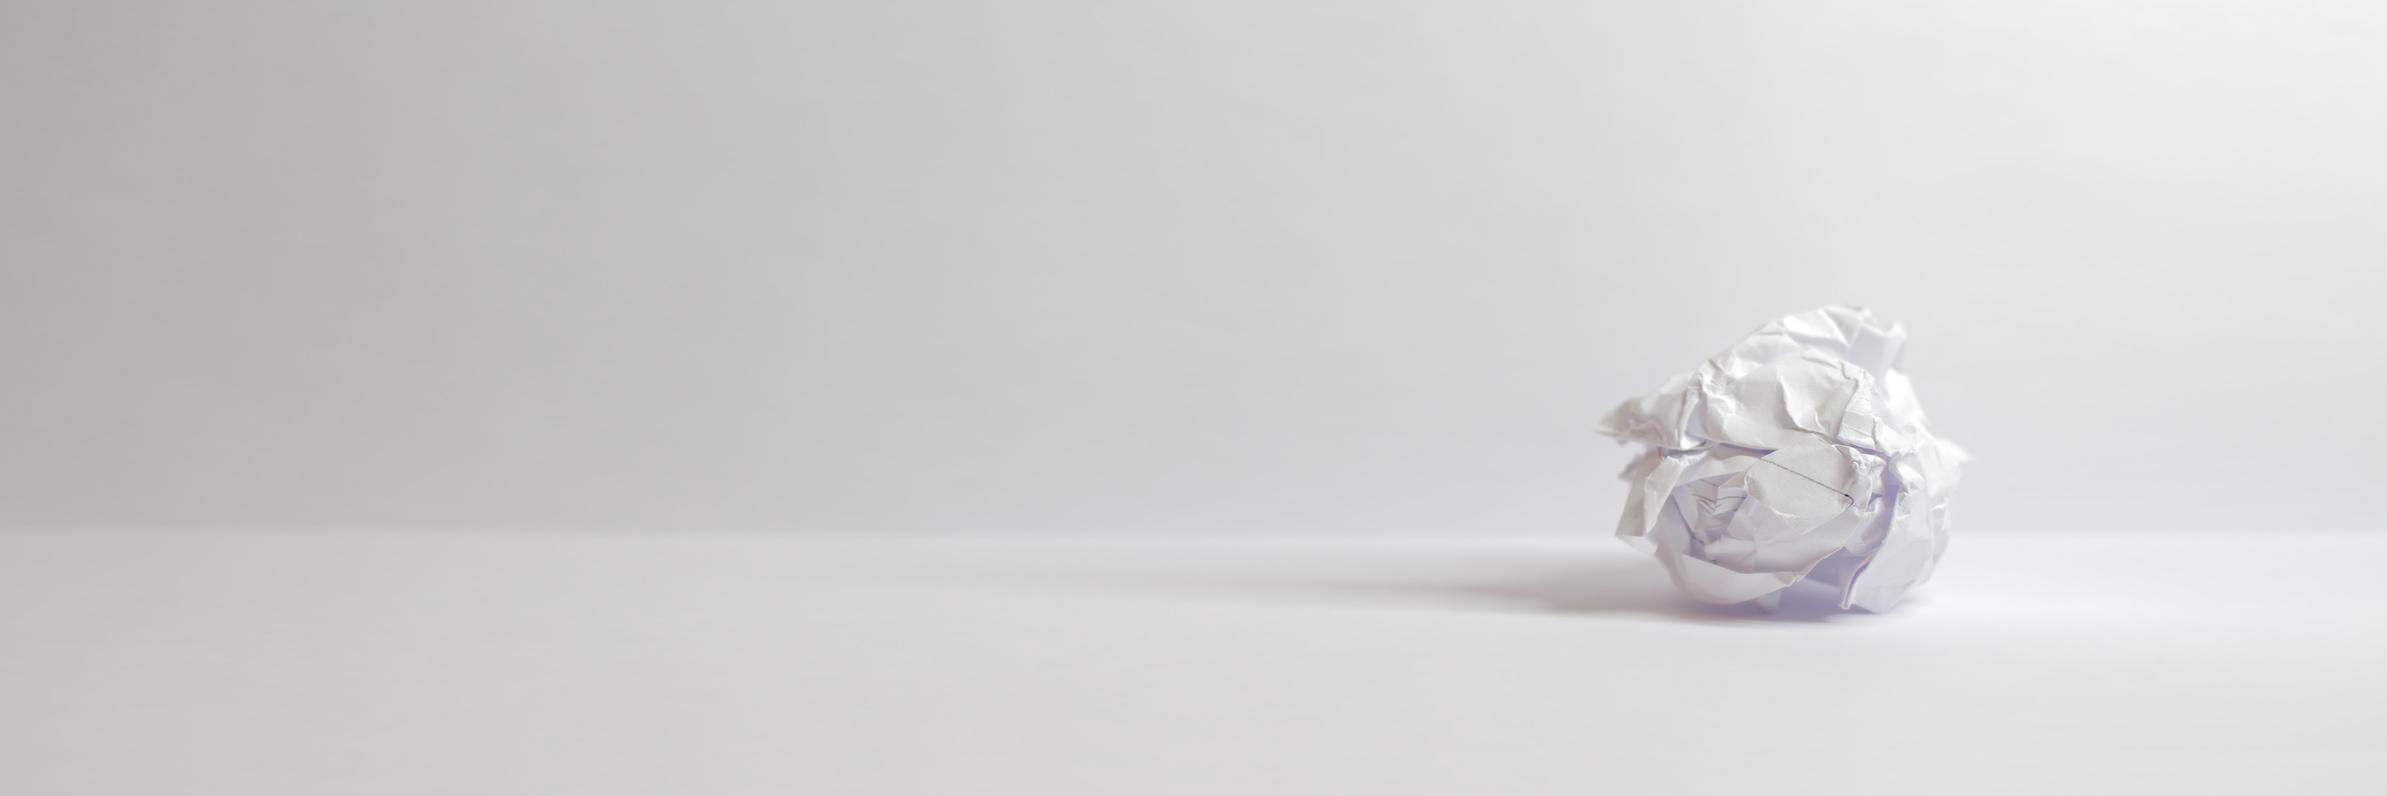 denis design kanzlei wrase. Black Bedroom Furniture Sets. Home Design Ideas